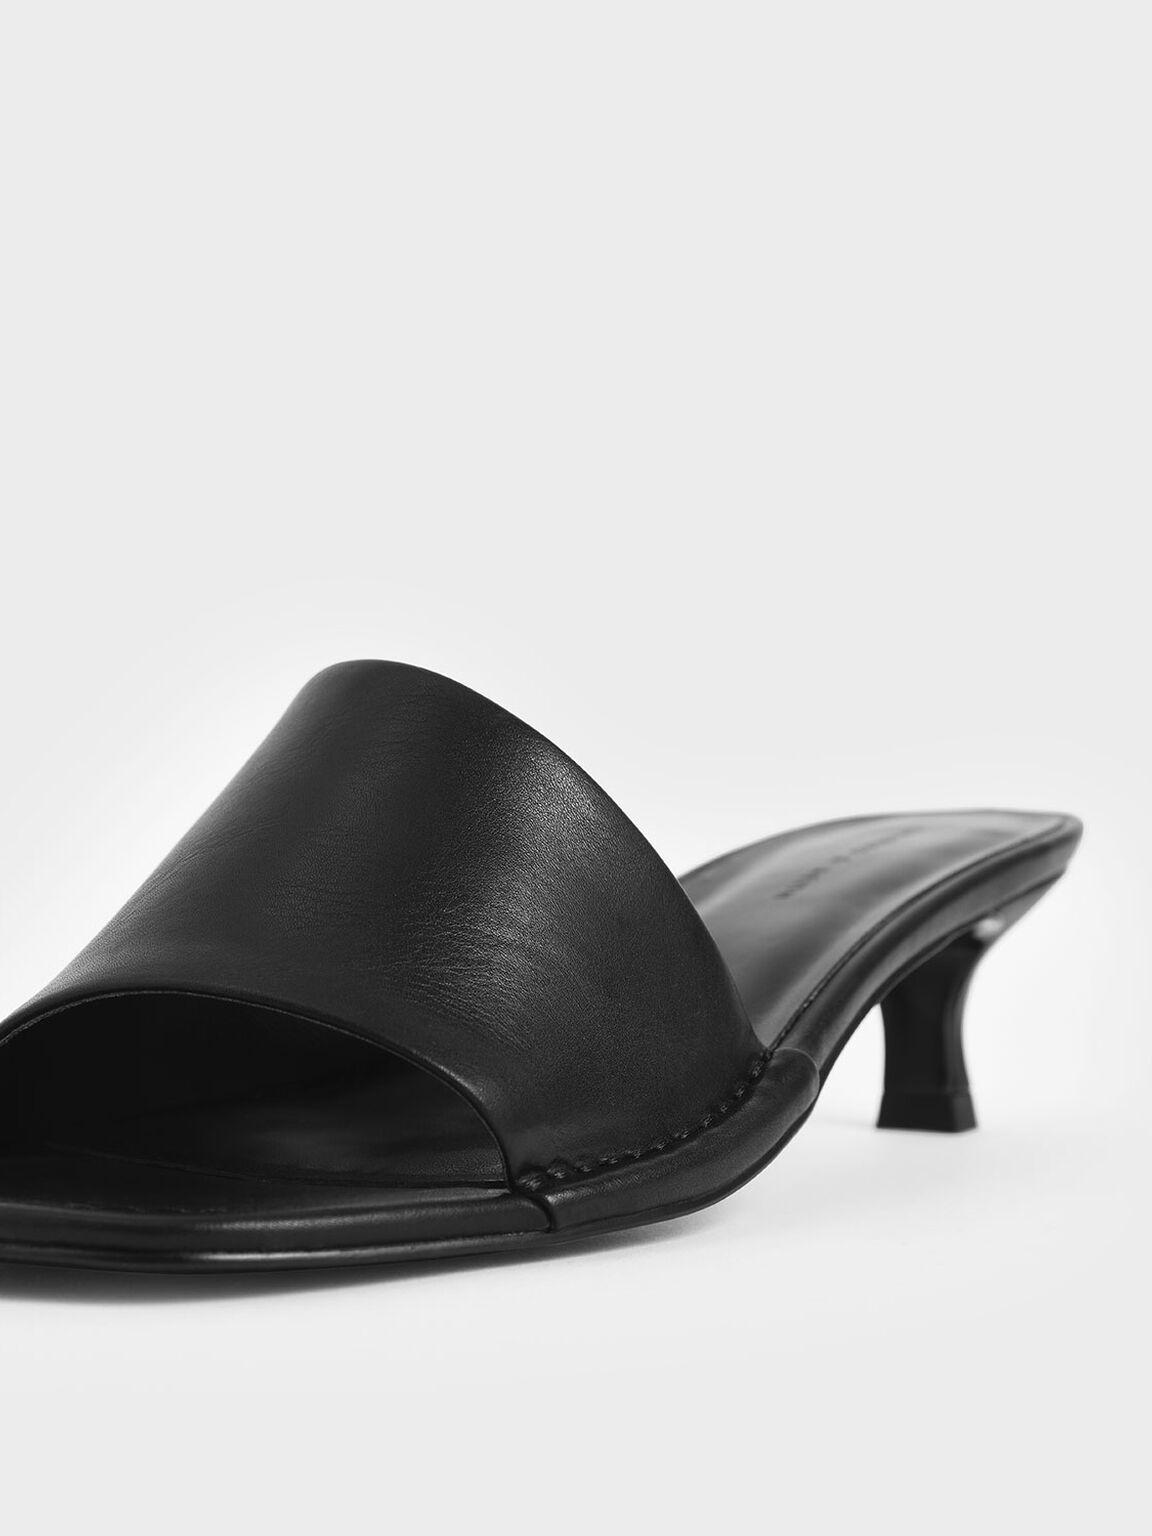 Asymmetric Strap Mules, Black, hi-res